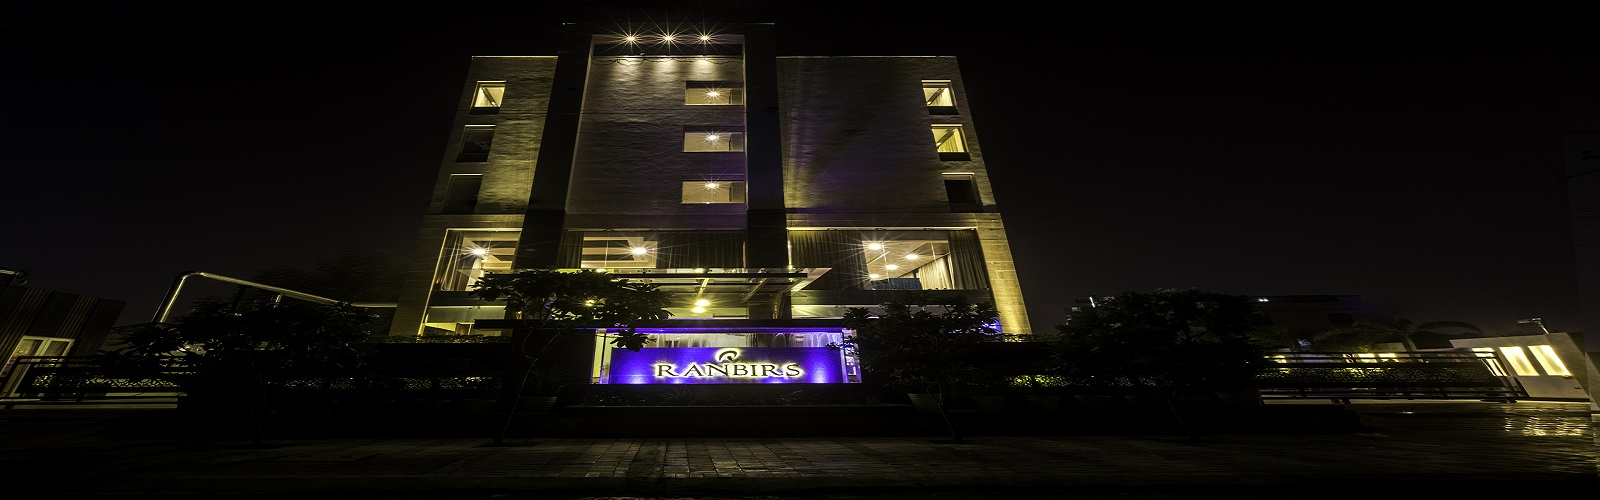 Hotel Ranbirs Slider Image